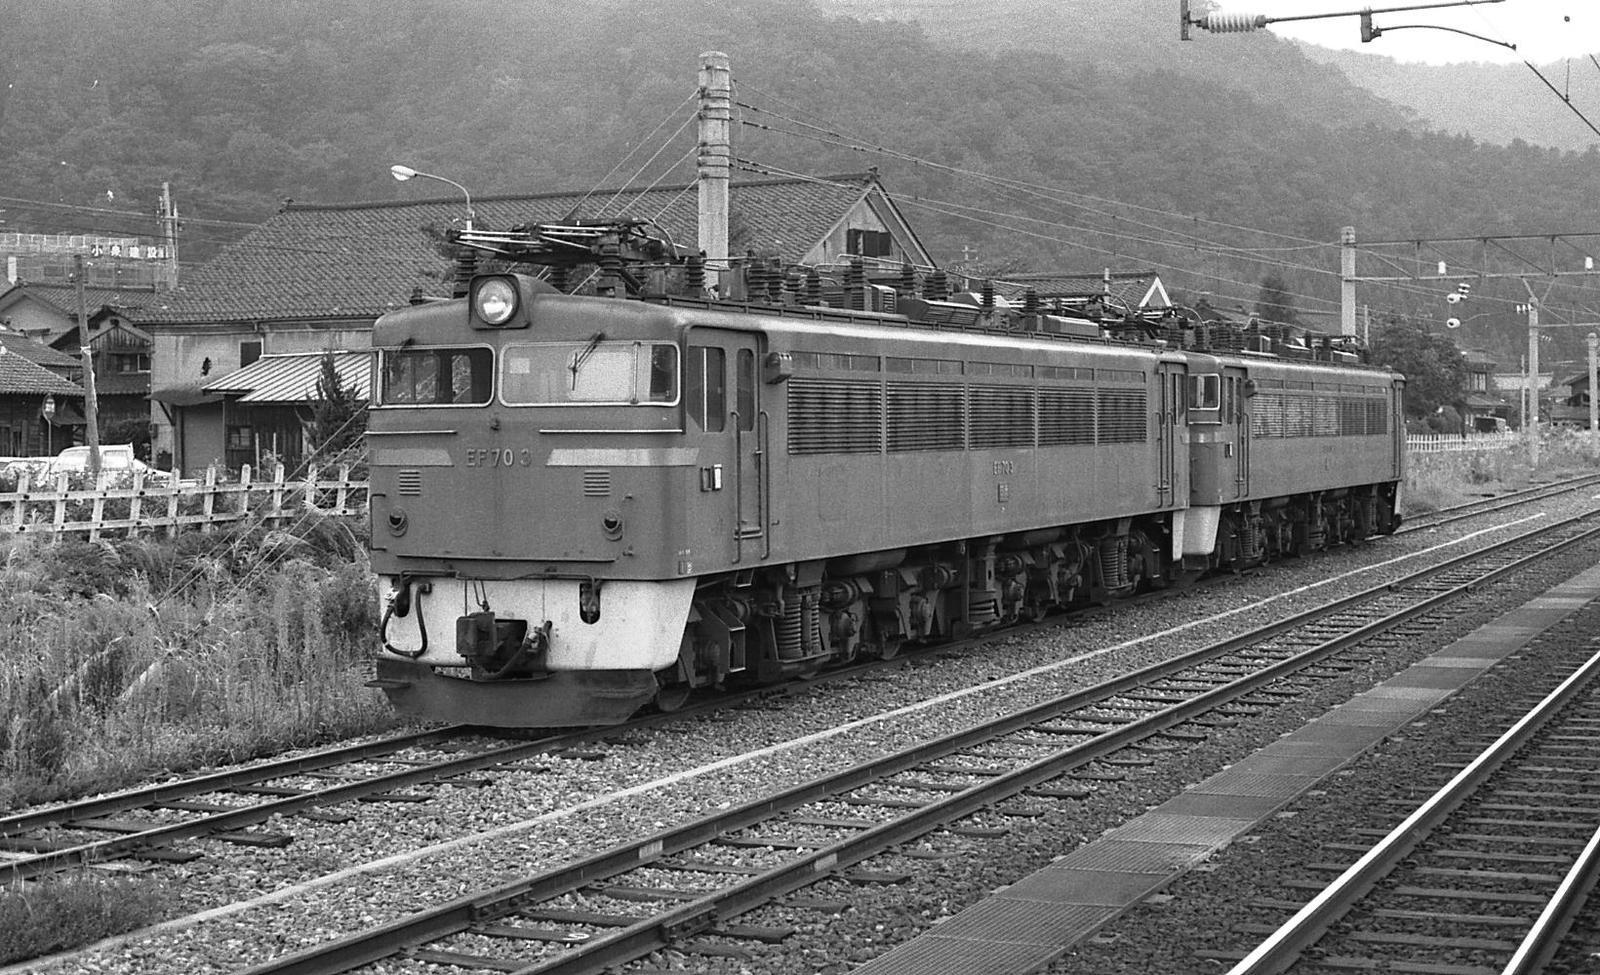 19791003d07